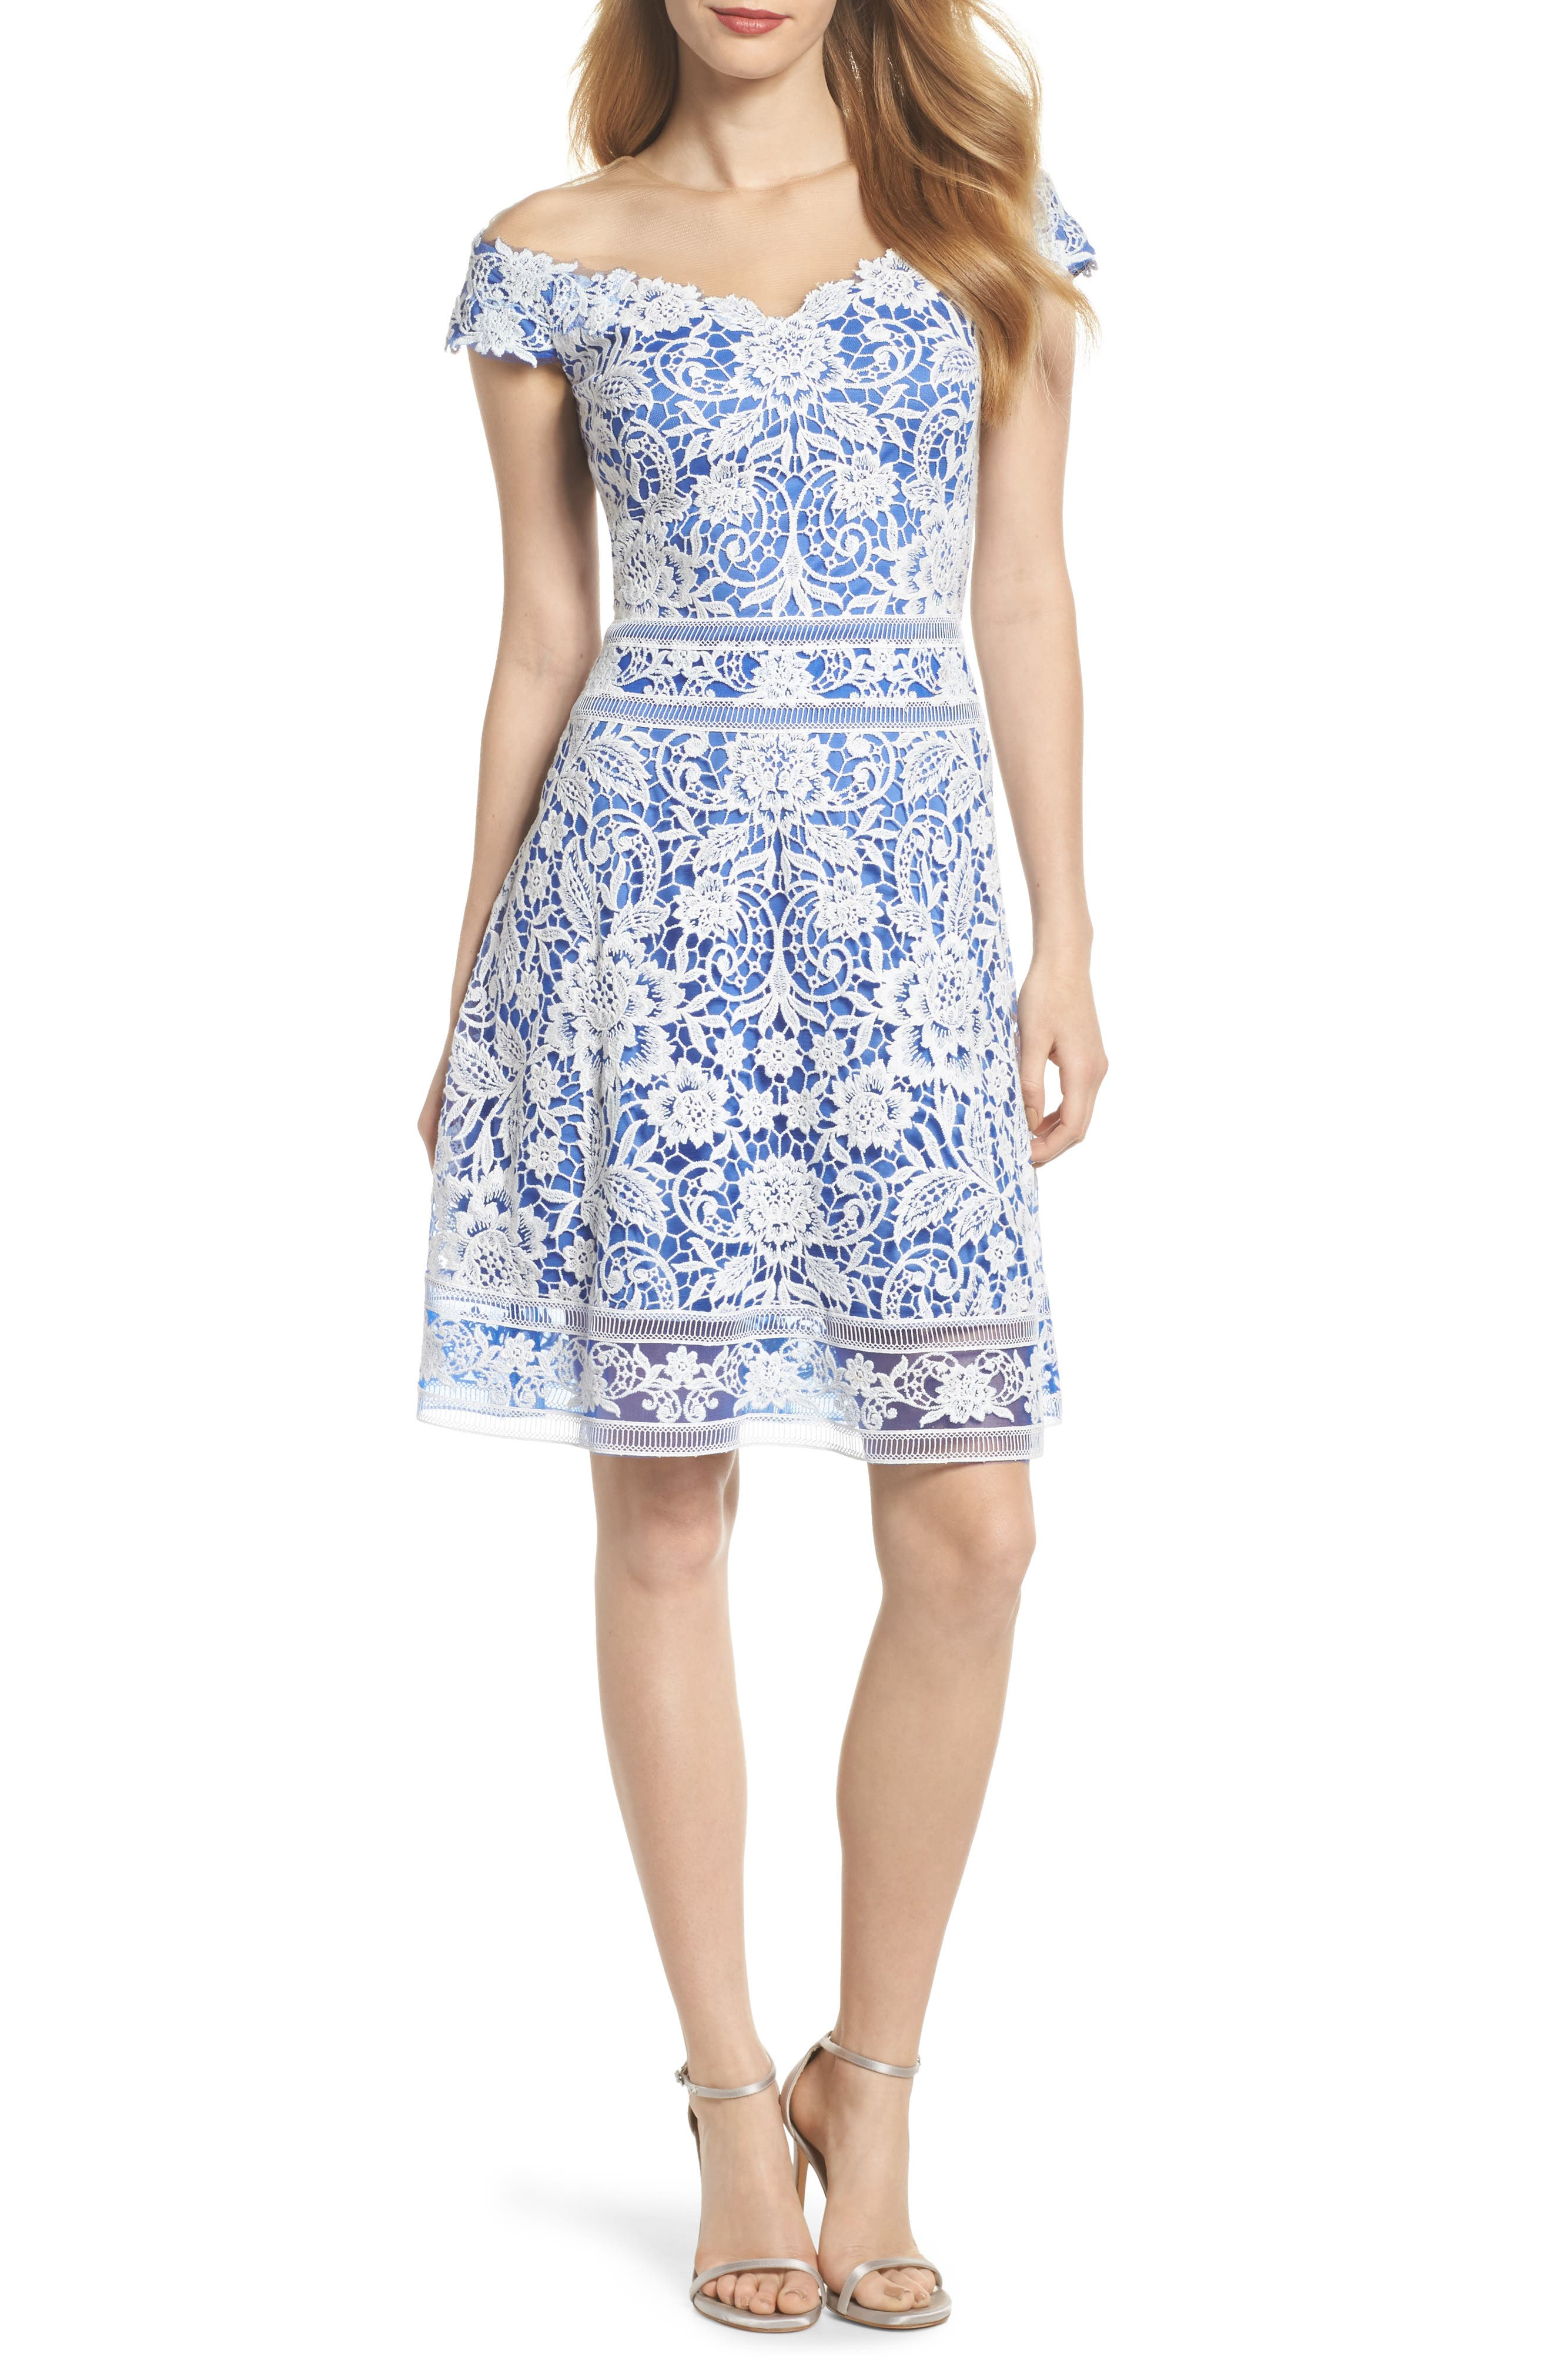 Alternate Image 1 Selected - Tadashi Shoji Illusion Neck Crochet Lace Dress